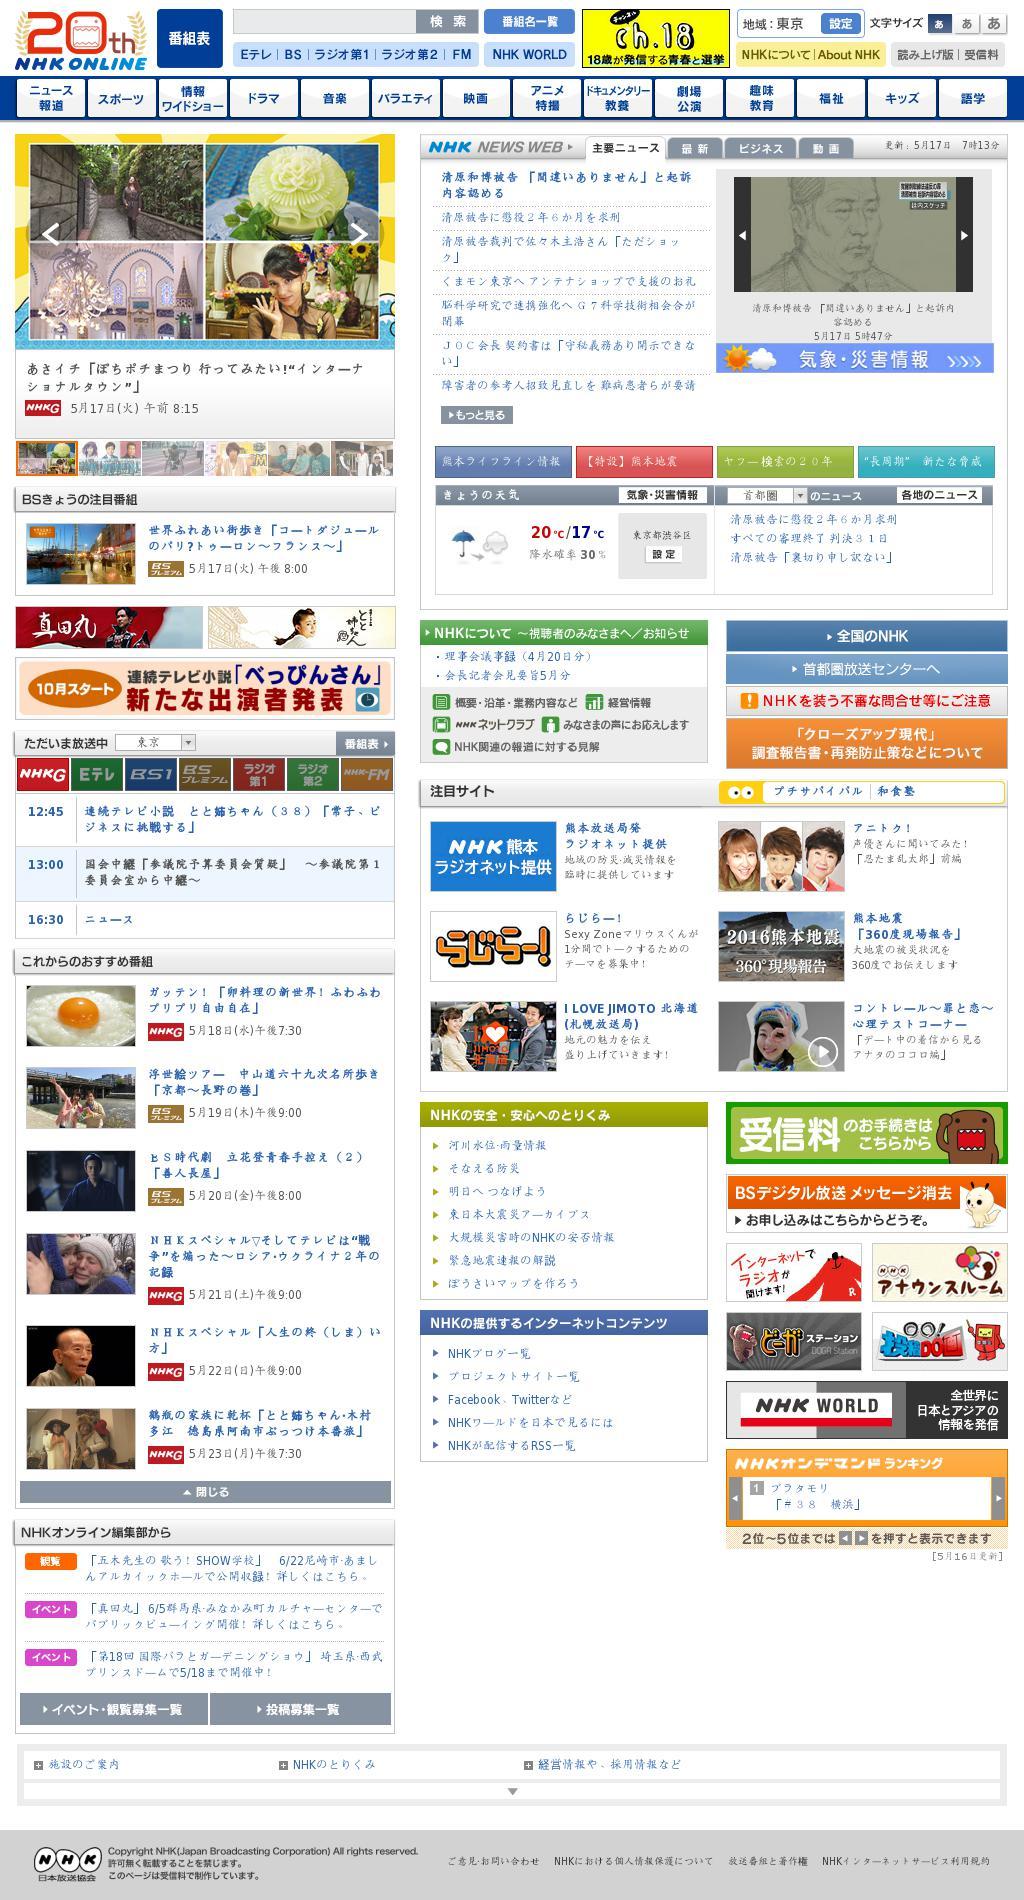 NHK Online at Tuesday May 17, 2016, 7:15 a.m. UTC